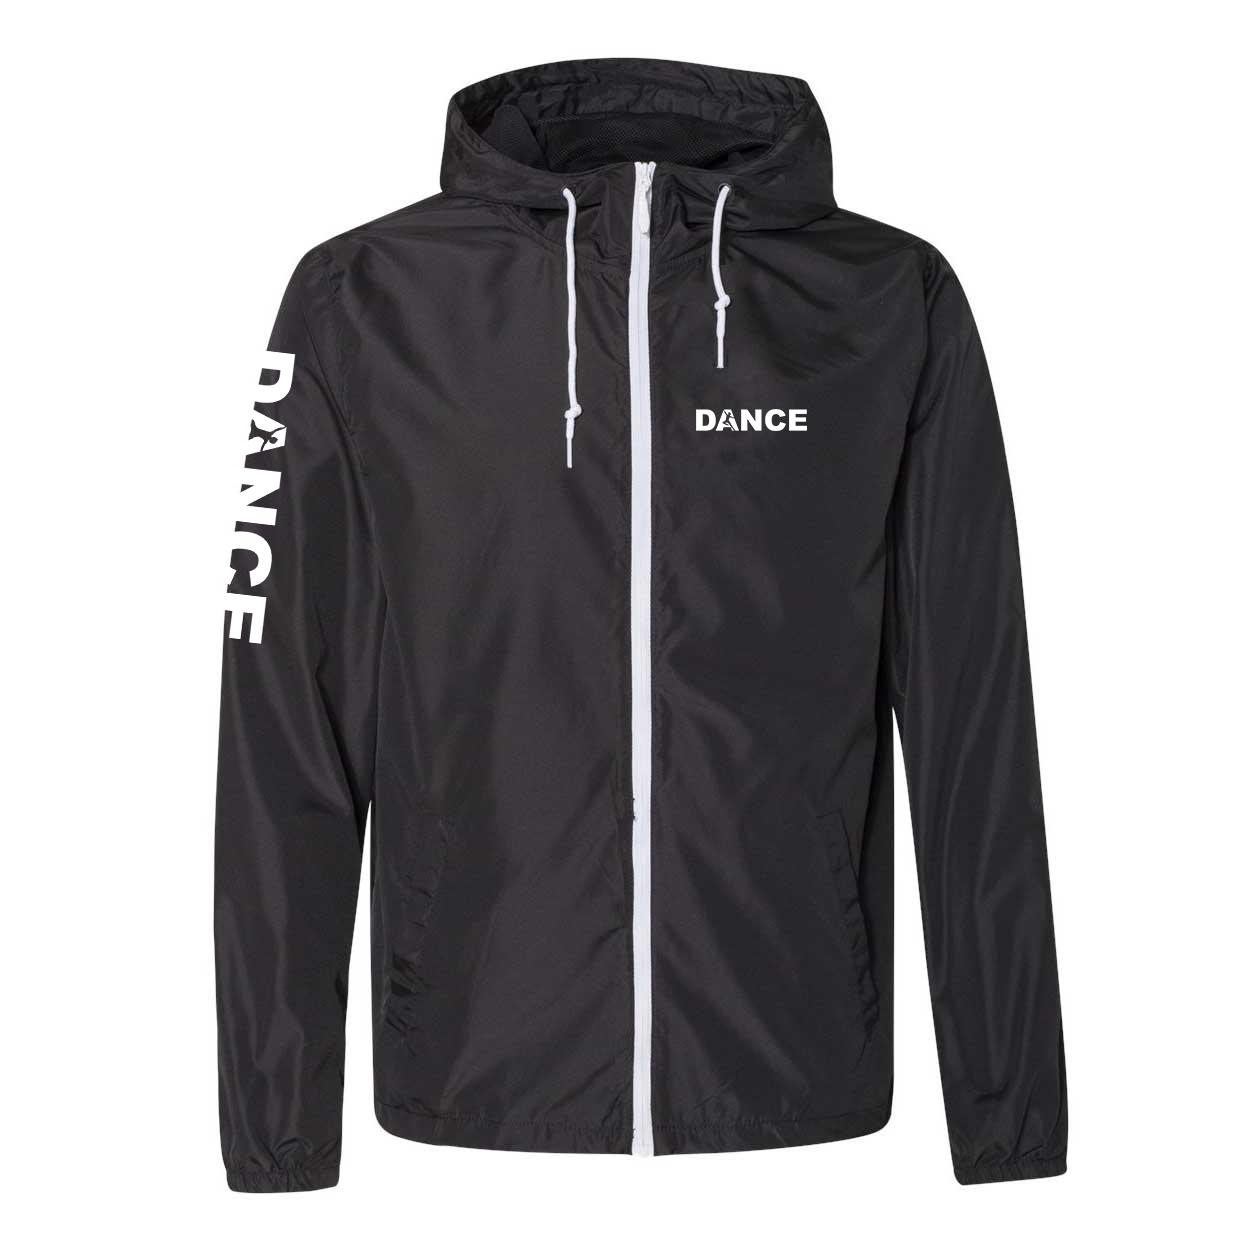 Dance Silhouette Logo Classic Lightweight Windbreaker Black/White (White Logo)